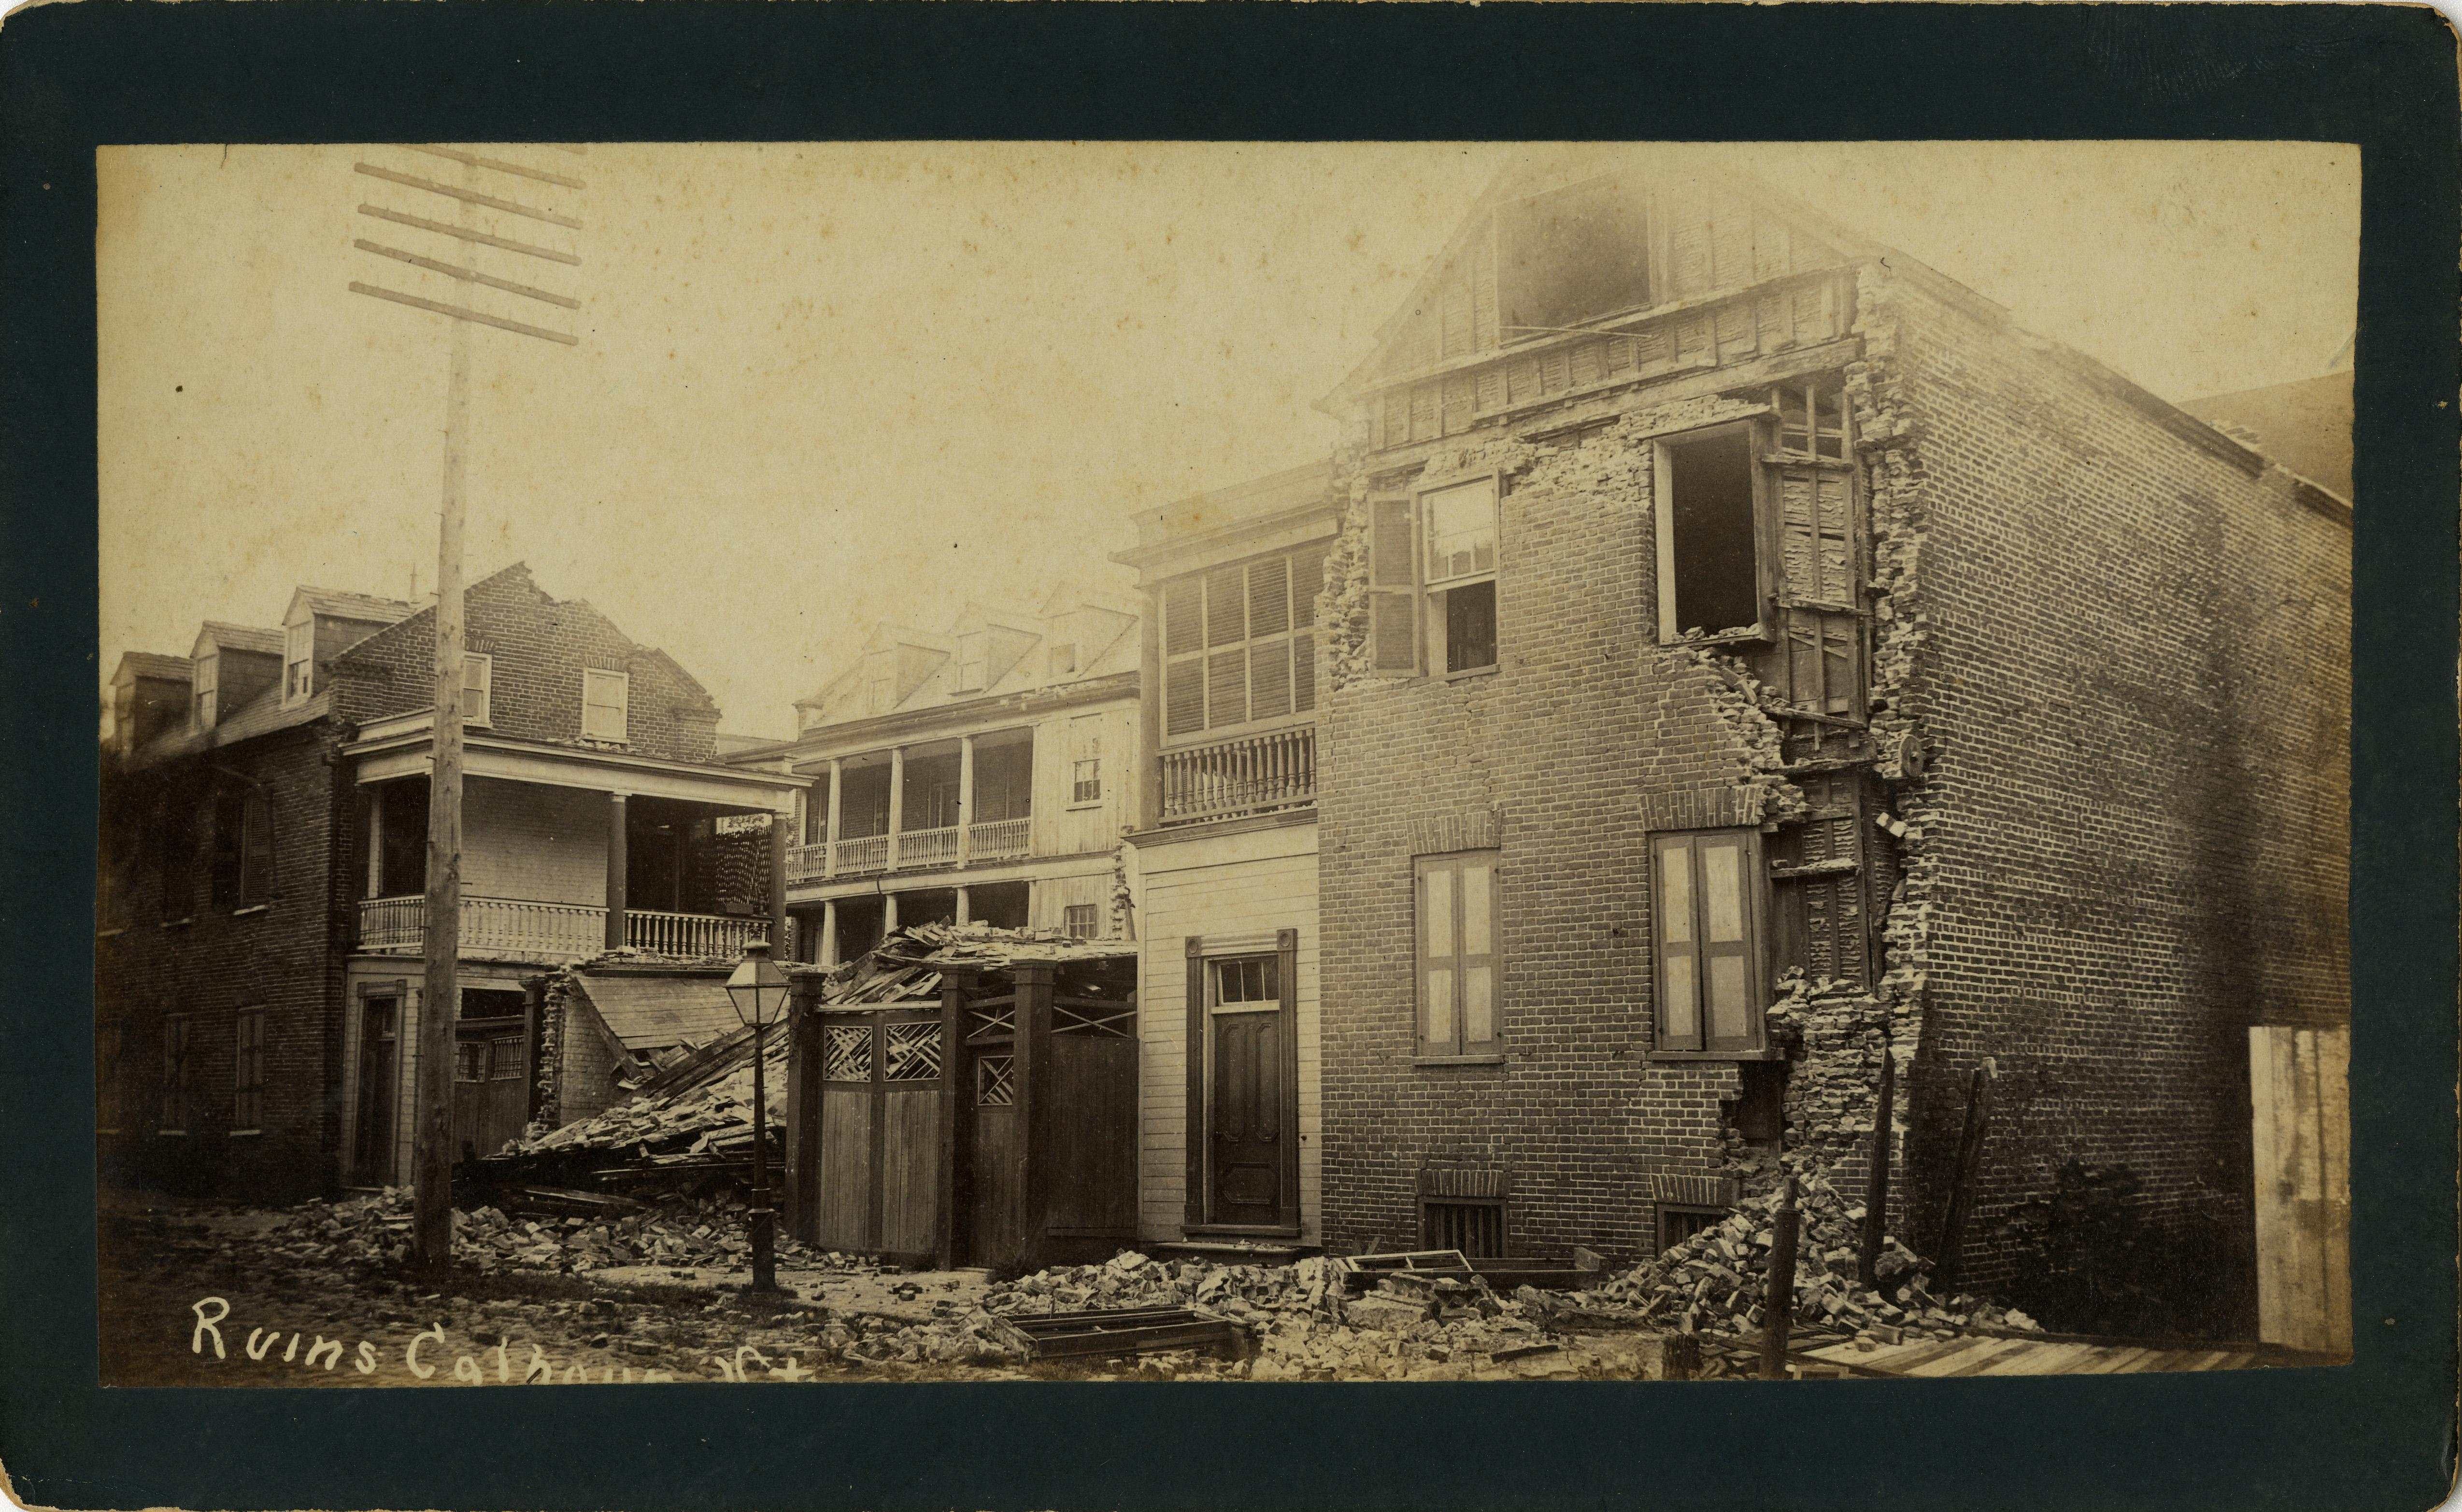 Calhoun Street